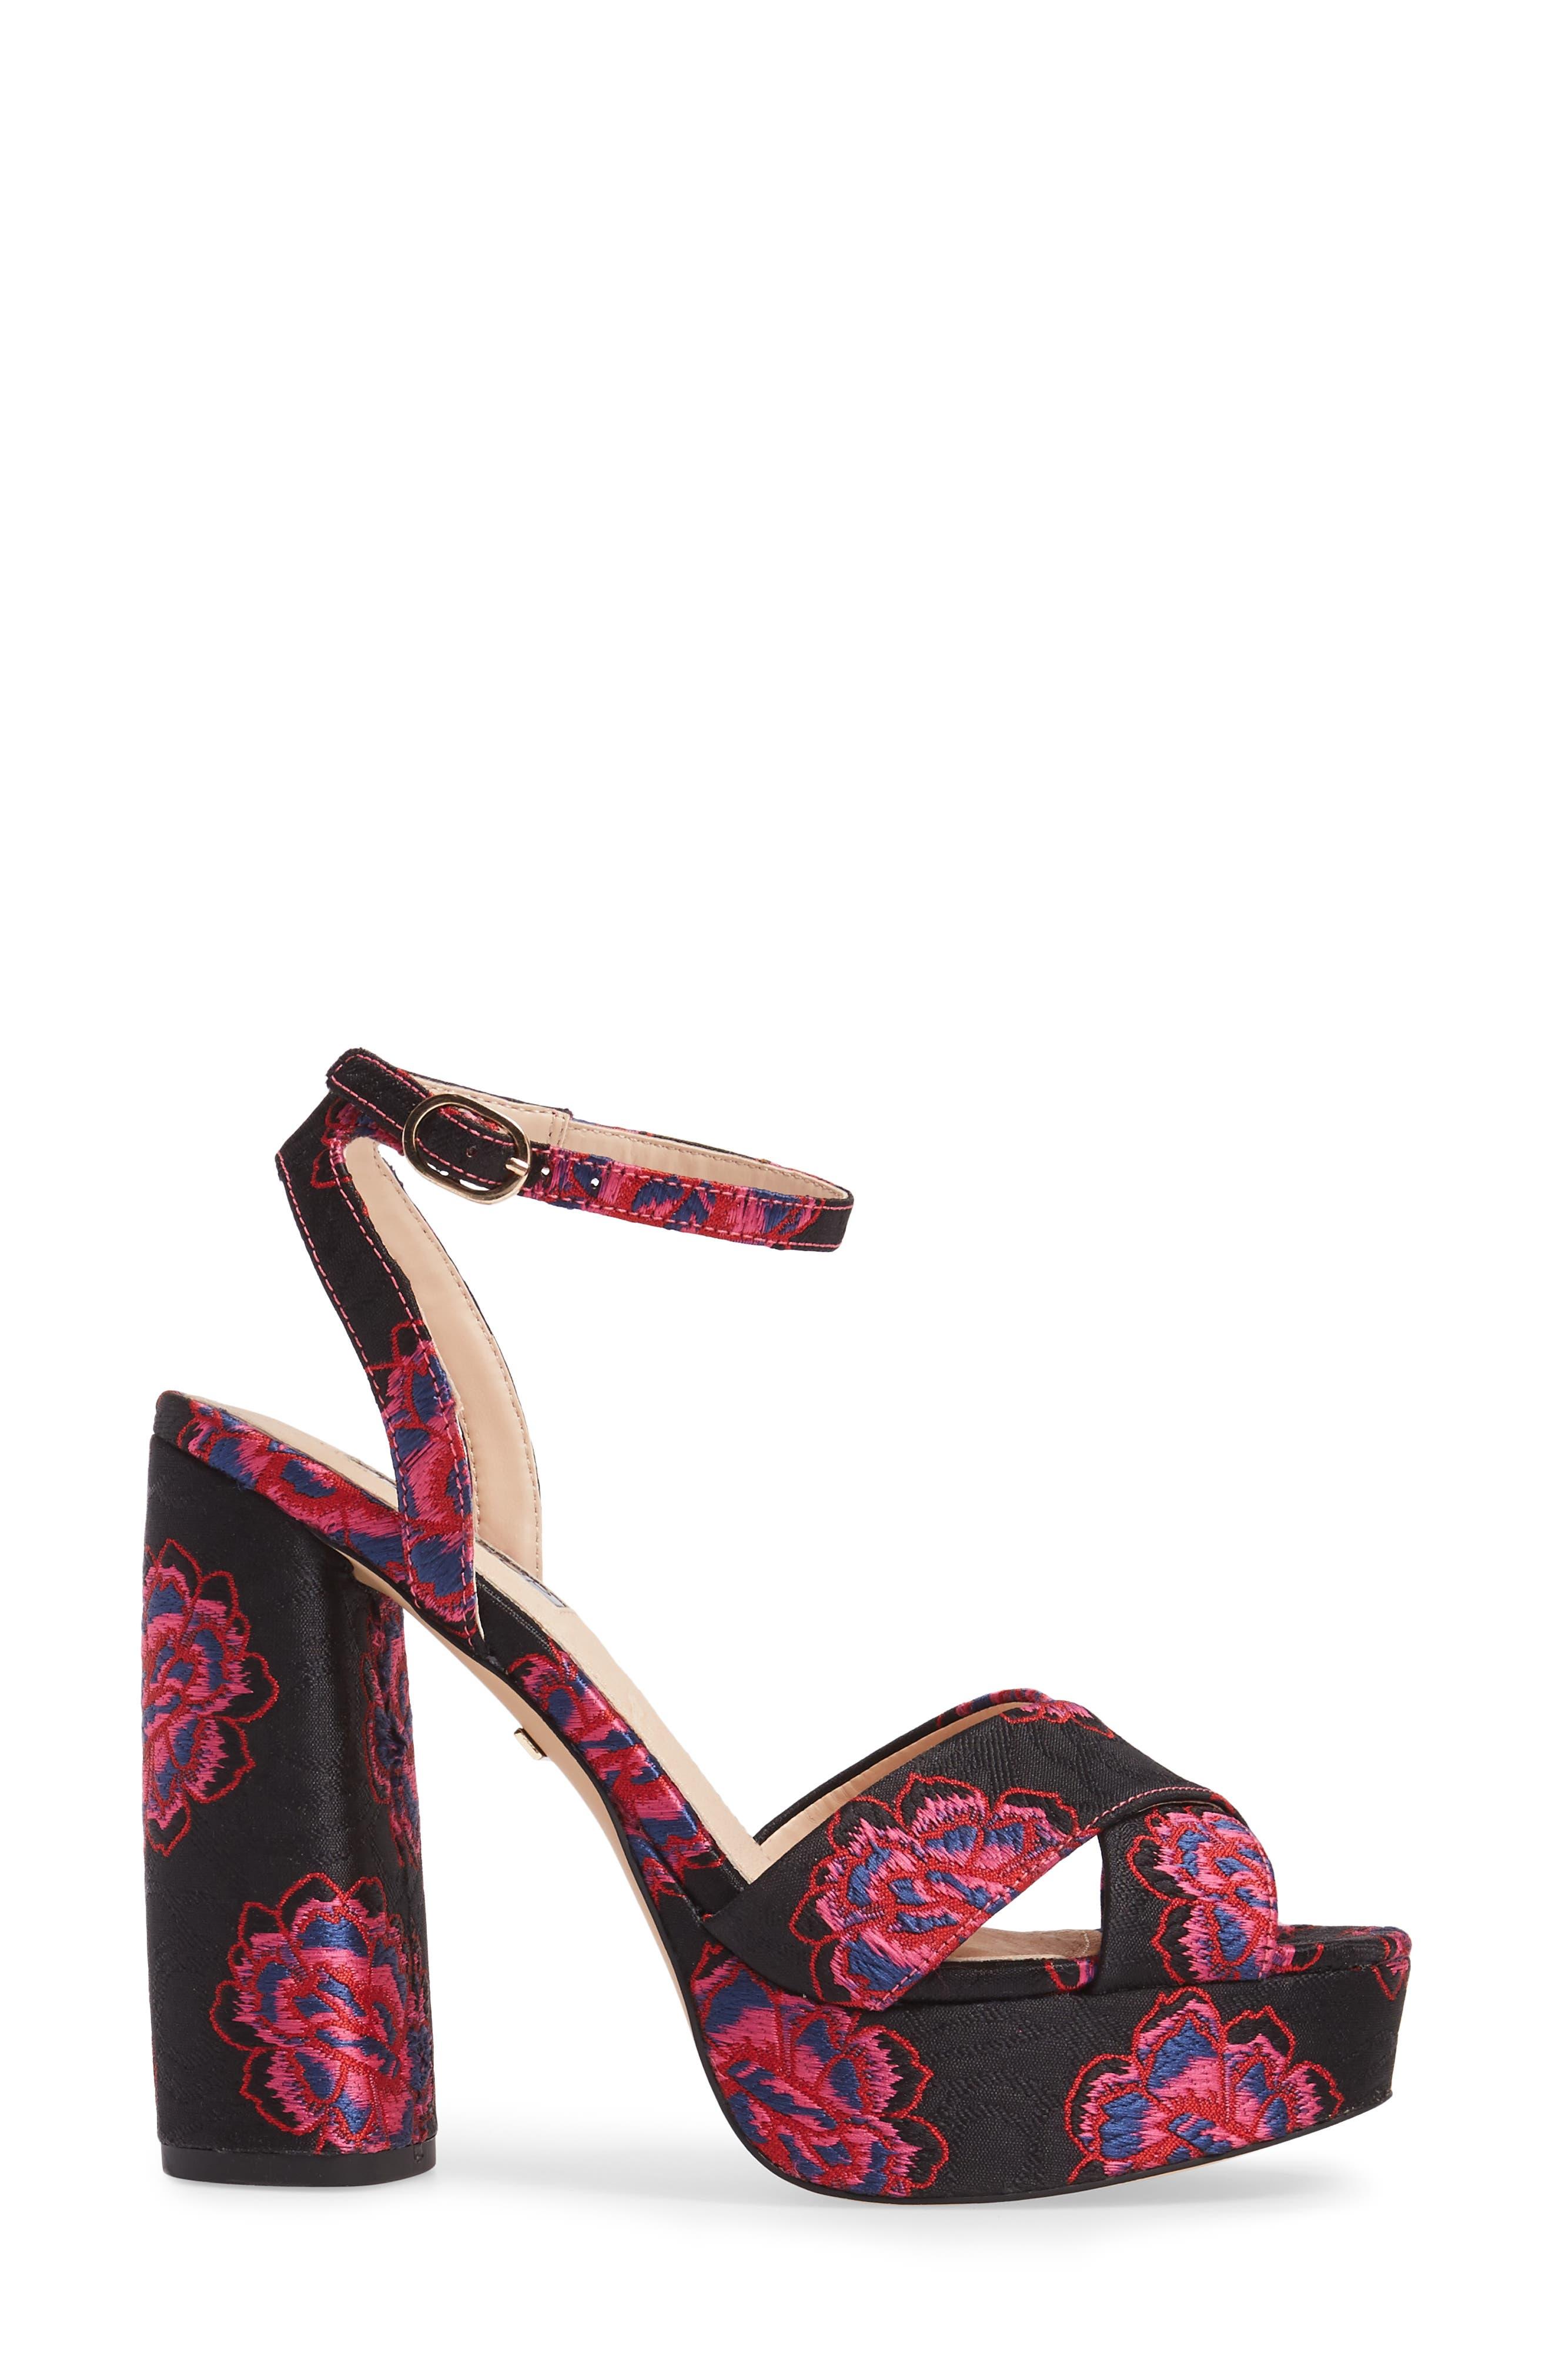 Alternate Image 3  - Topshop Lollie Embroidered Sandals (Women)